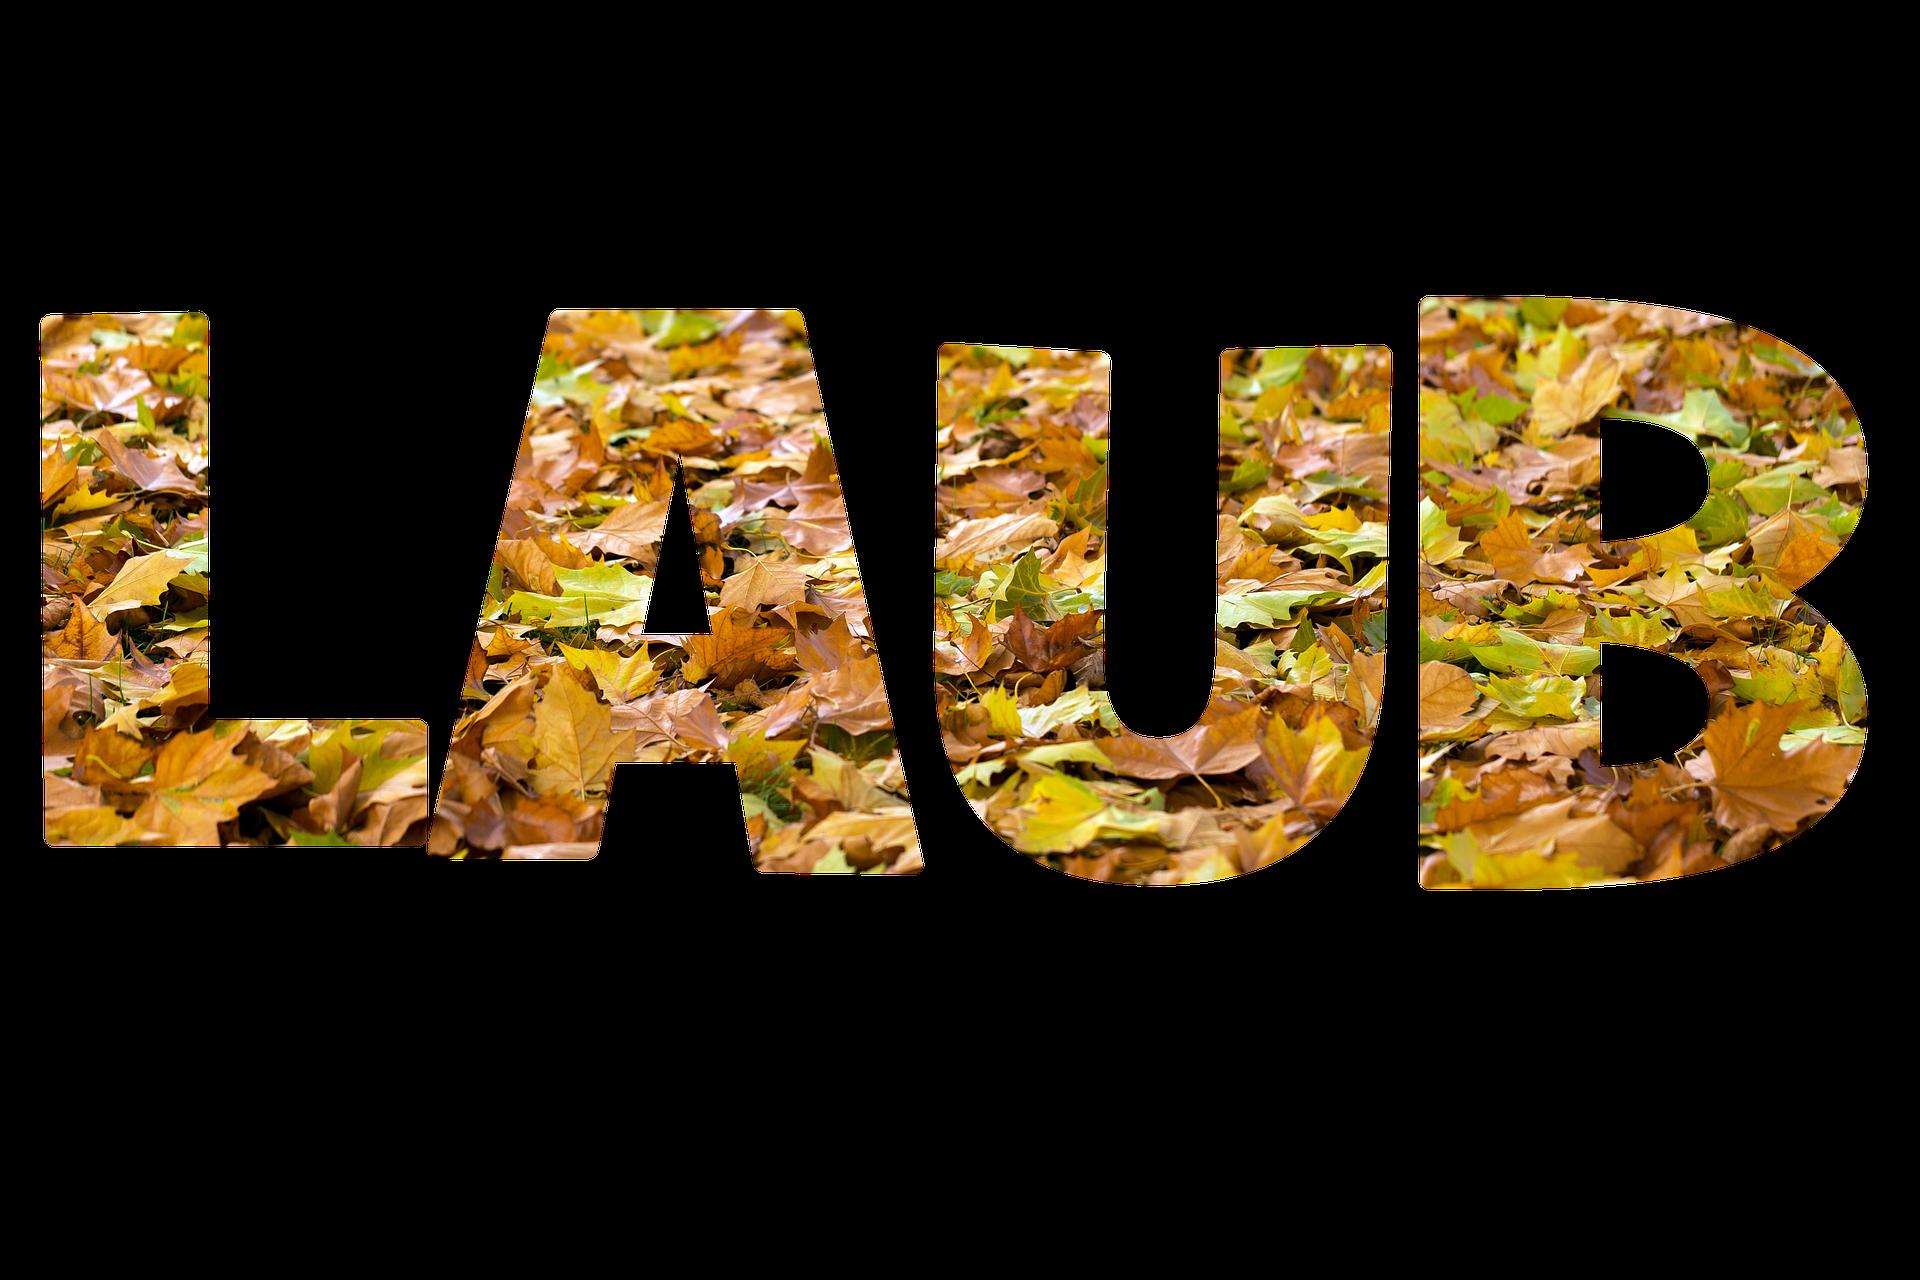 Laub Schriftzug, Herkunft Pixabay